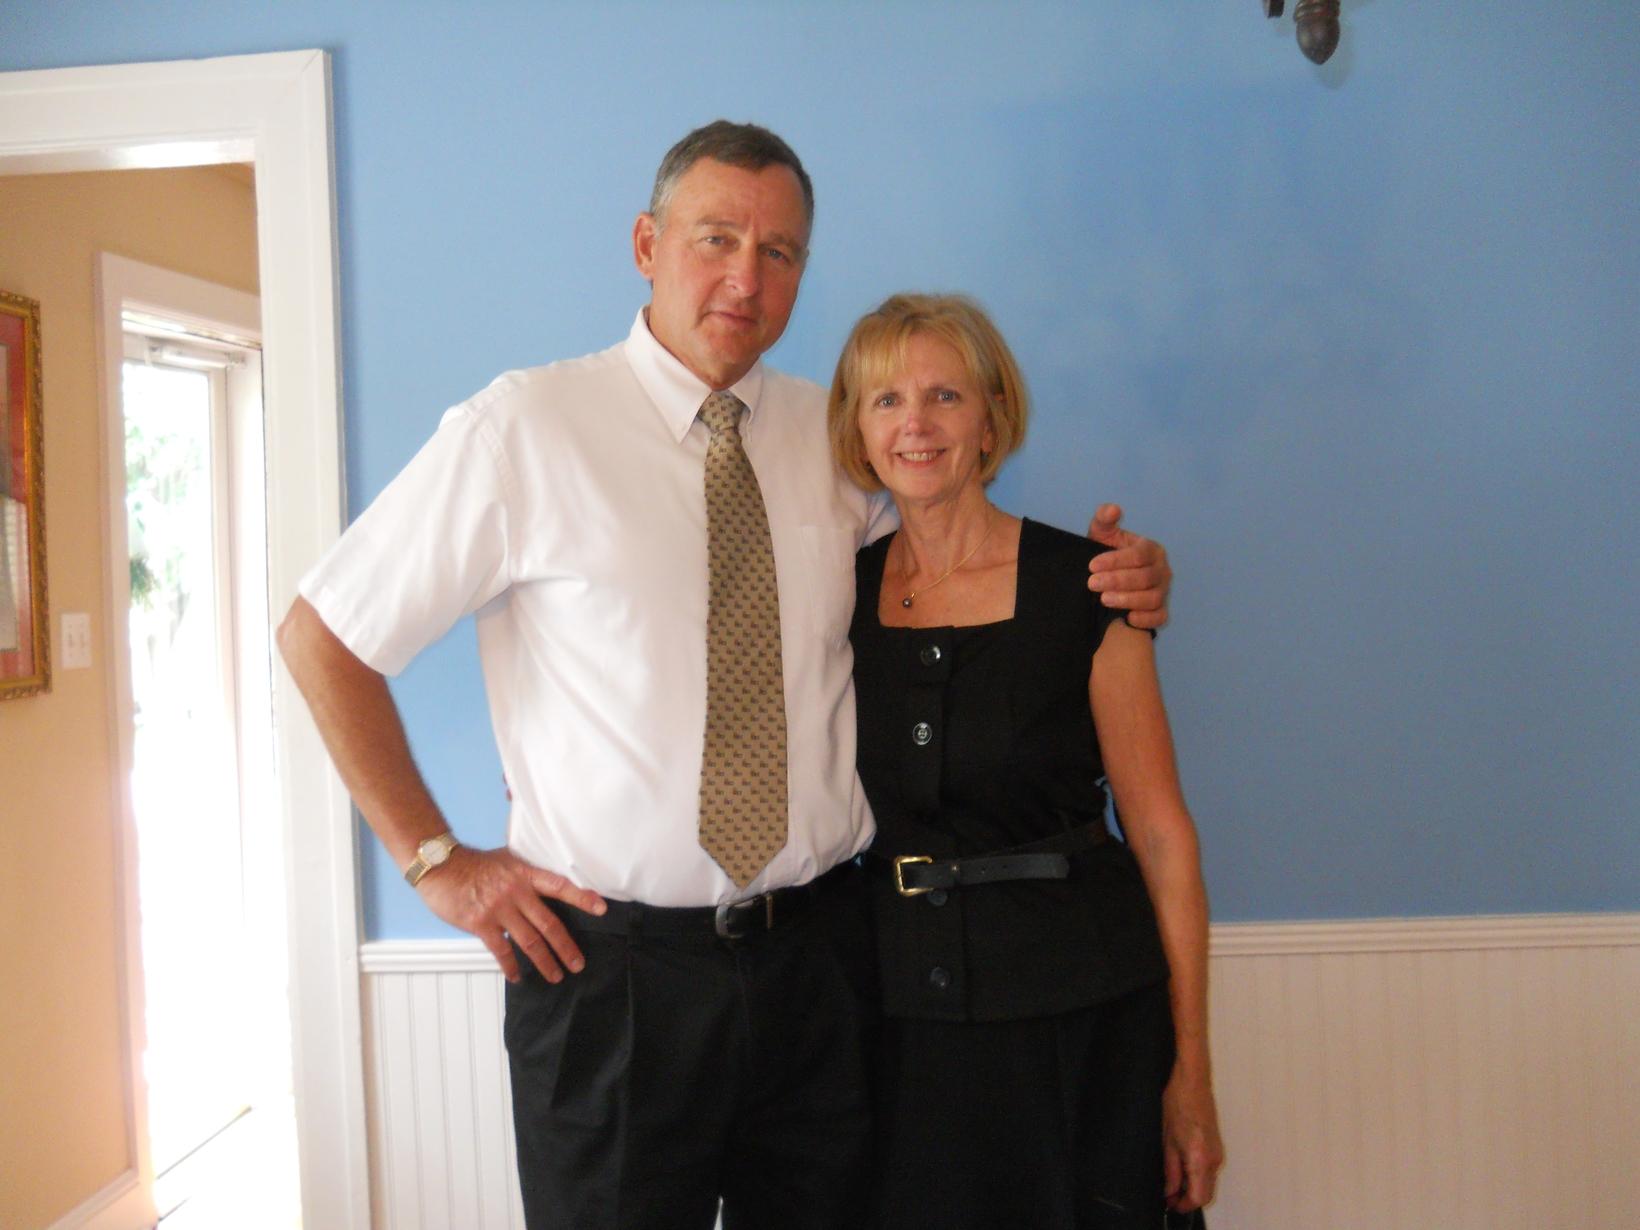 Donna & Don from Tucson, Arizona, United States